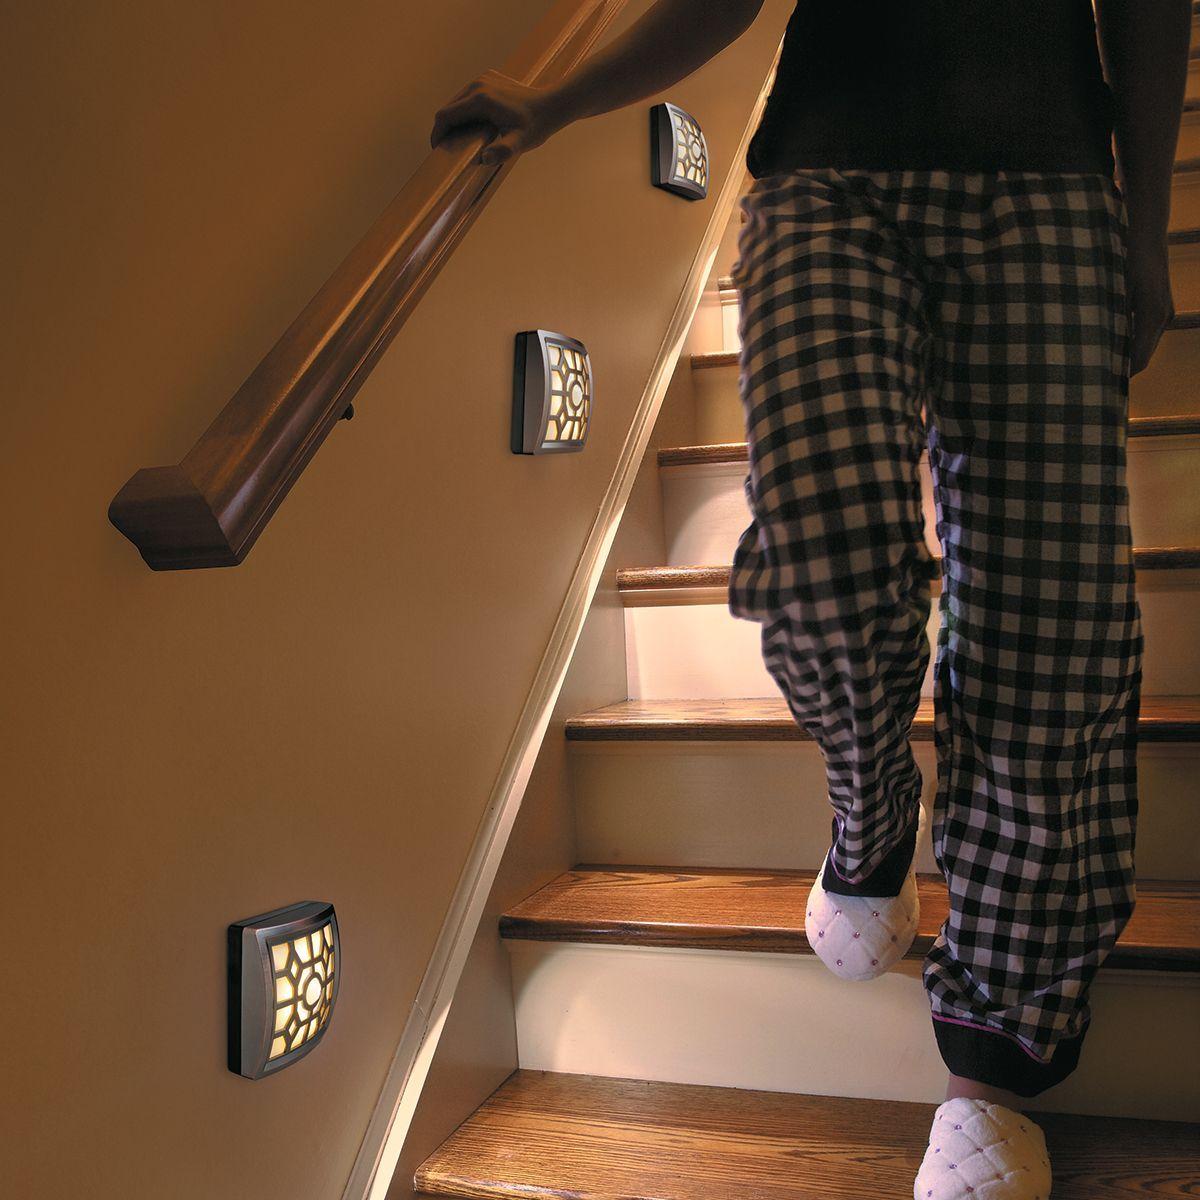 Motion Sensor Stair Lights Soft Glow Led Motion Sensor Light Staircases Lights And Stairways